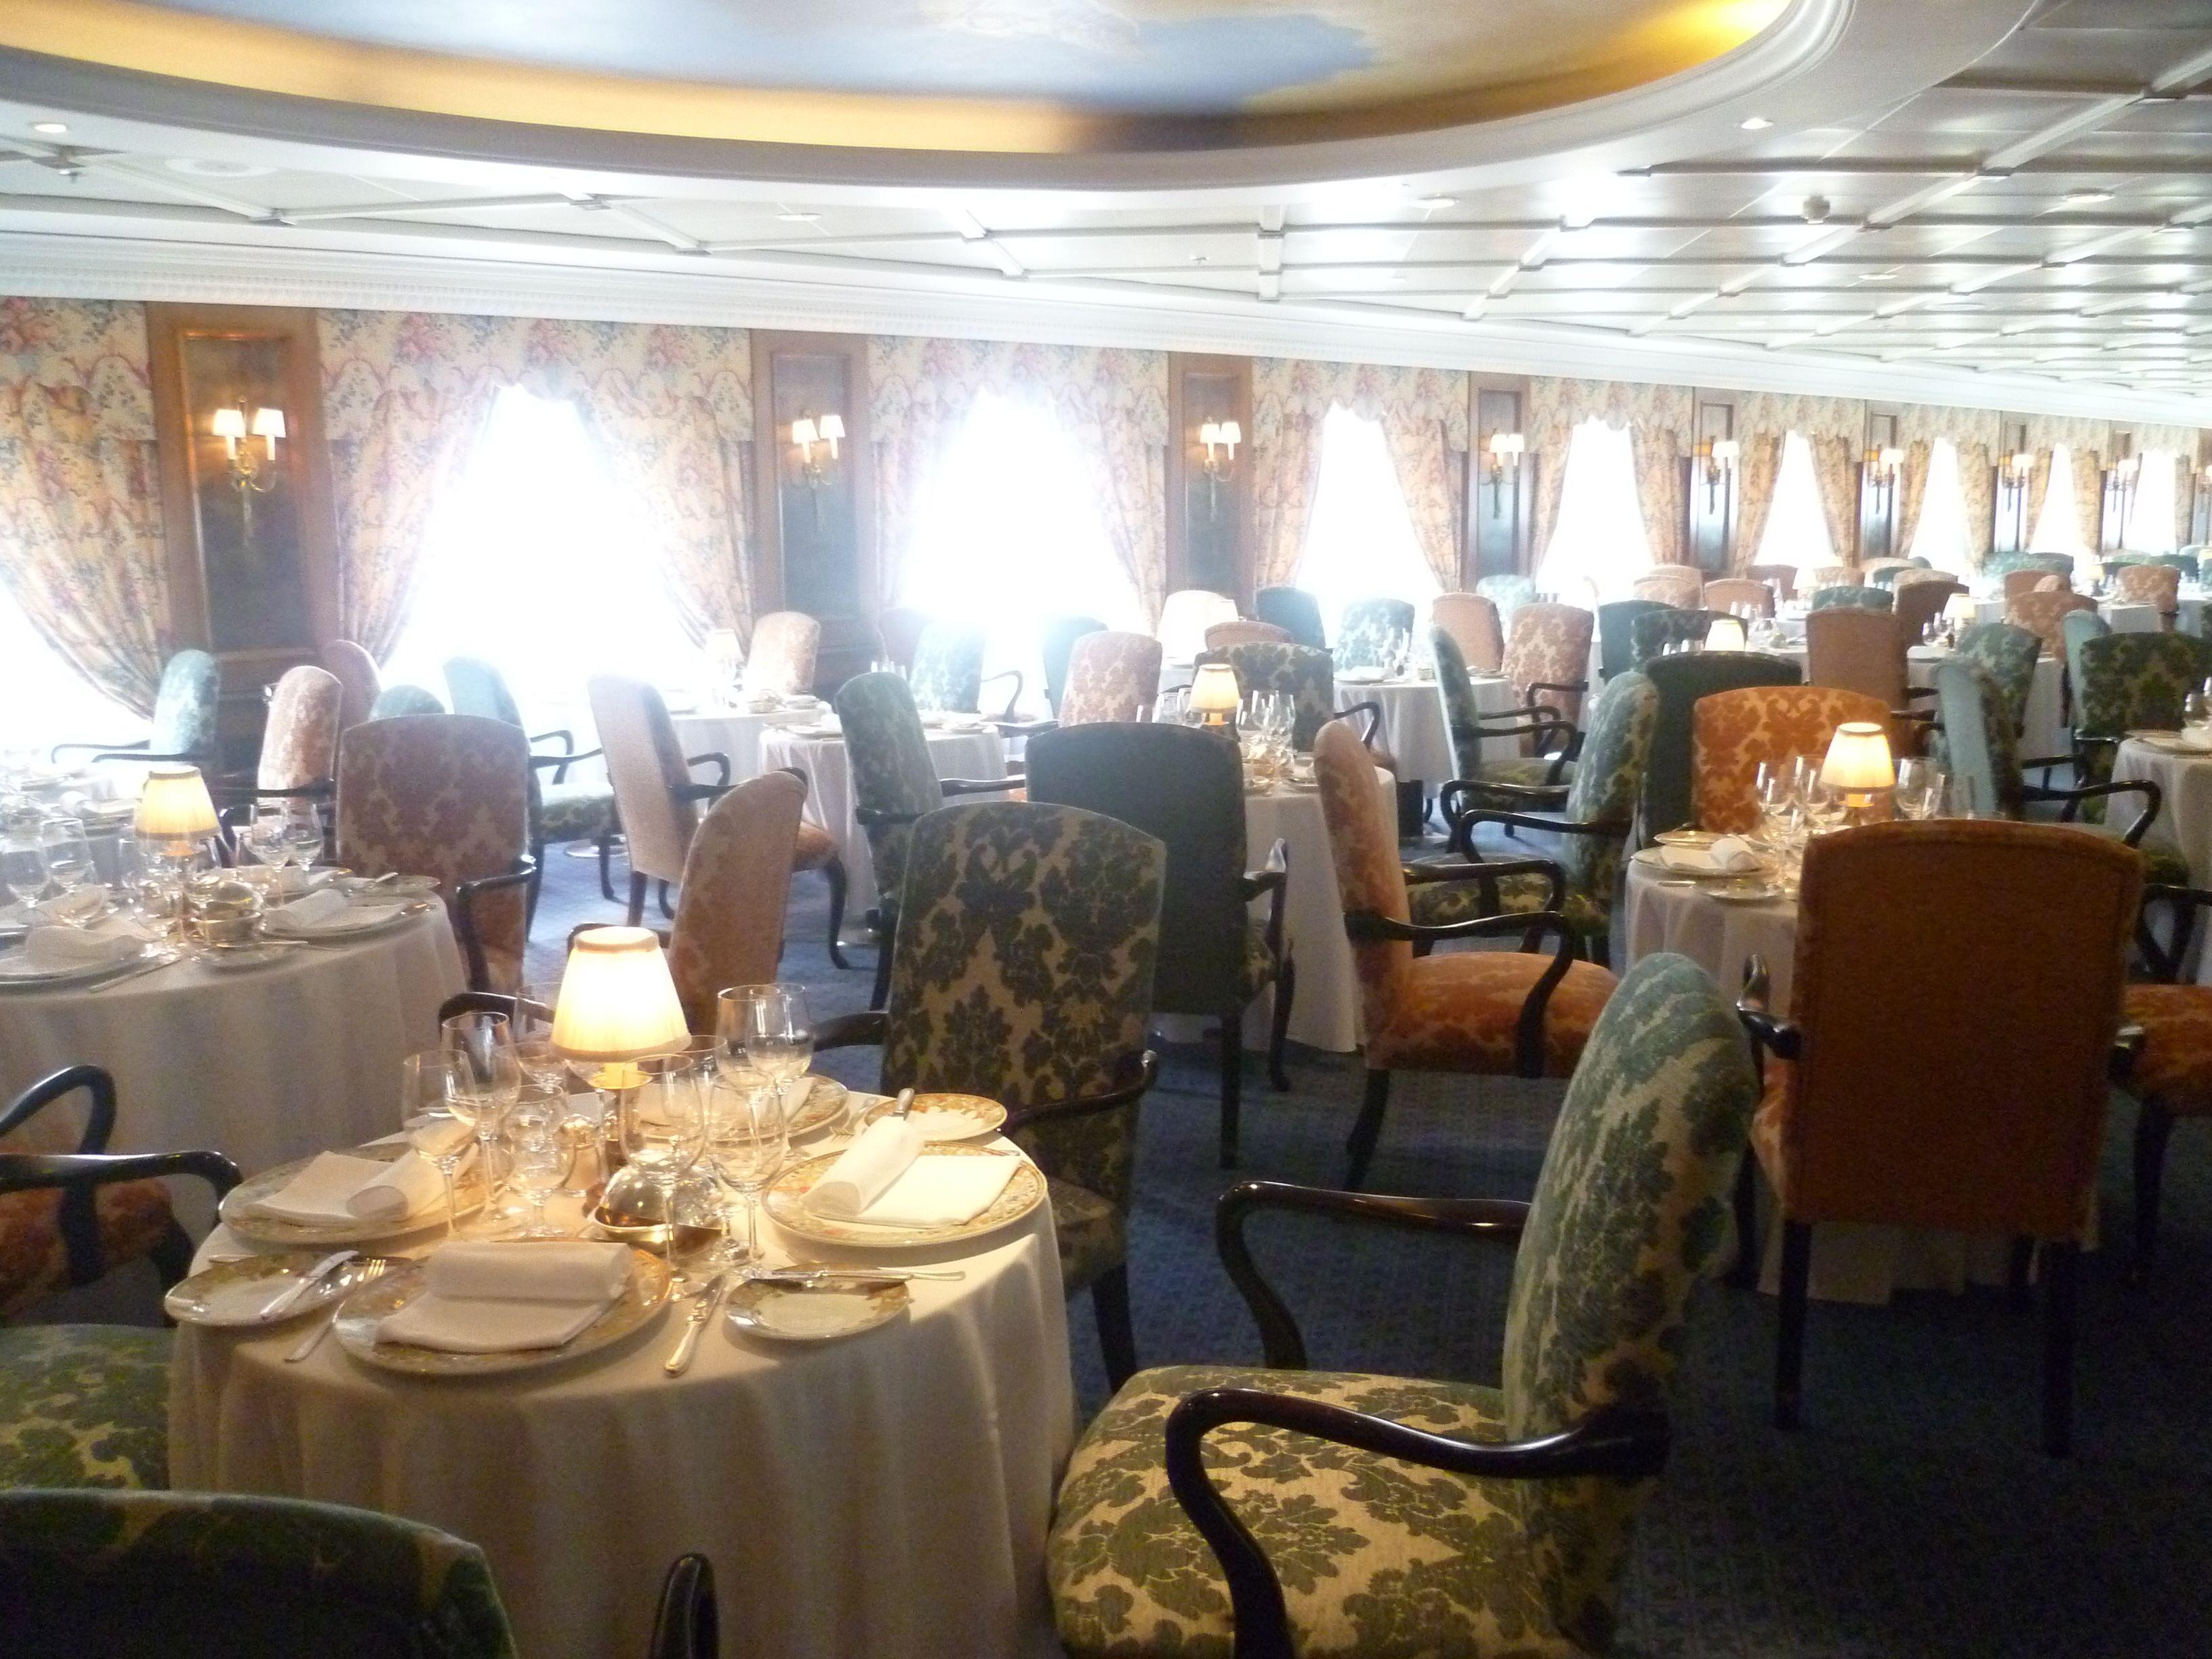 collection buffet hotel dining sablon nh brussels room breakfast grand restaurants